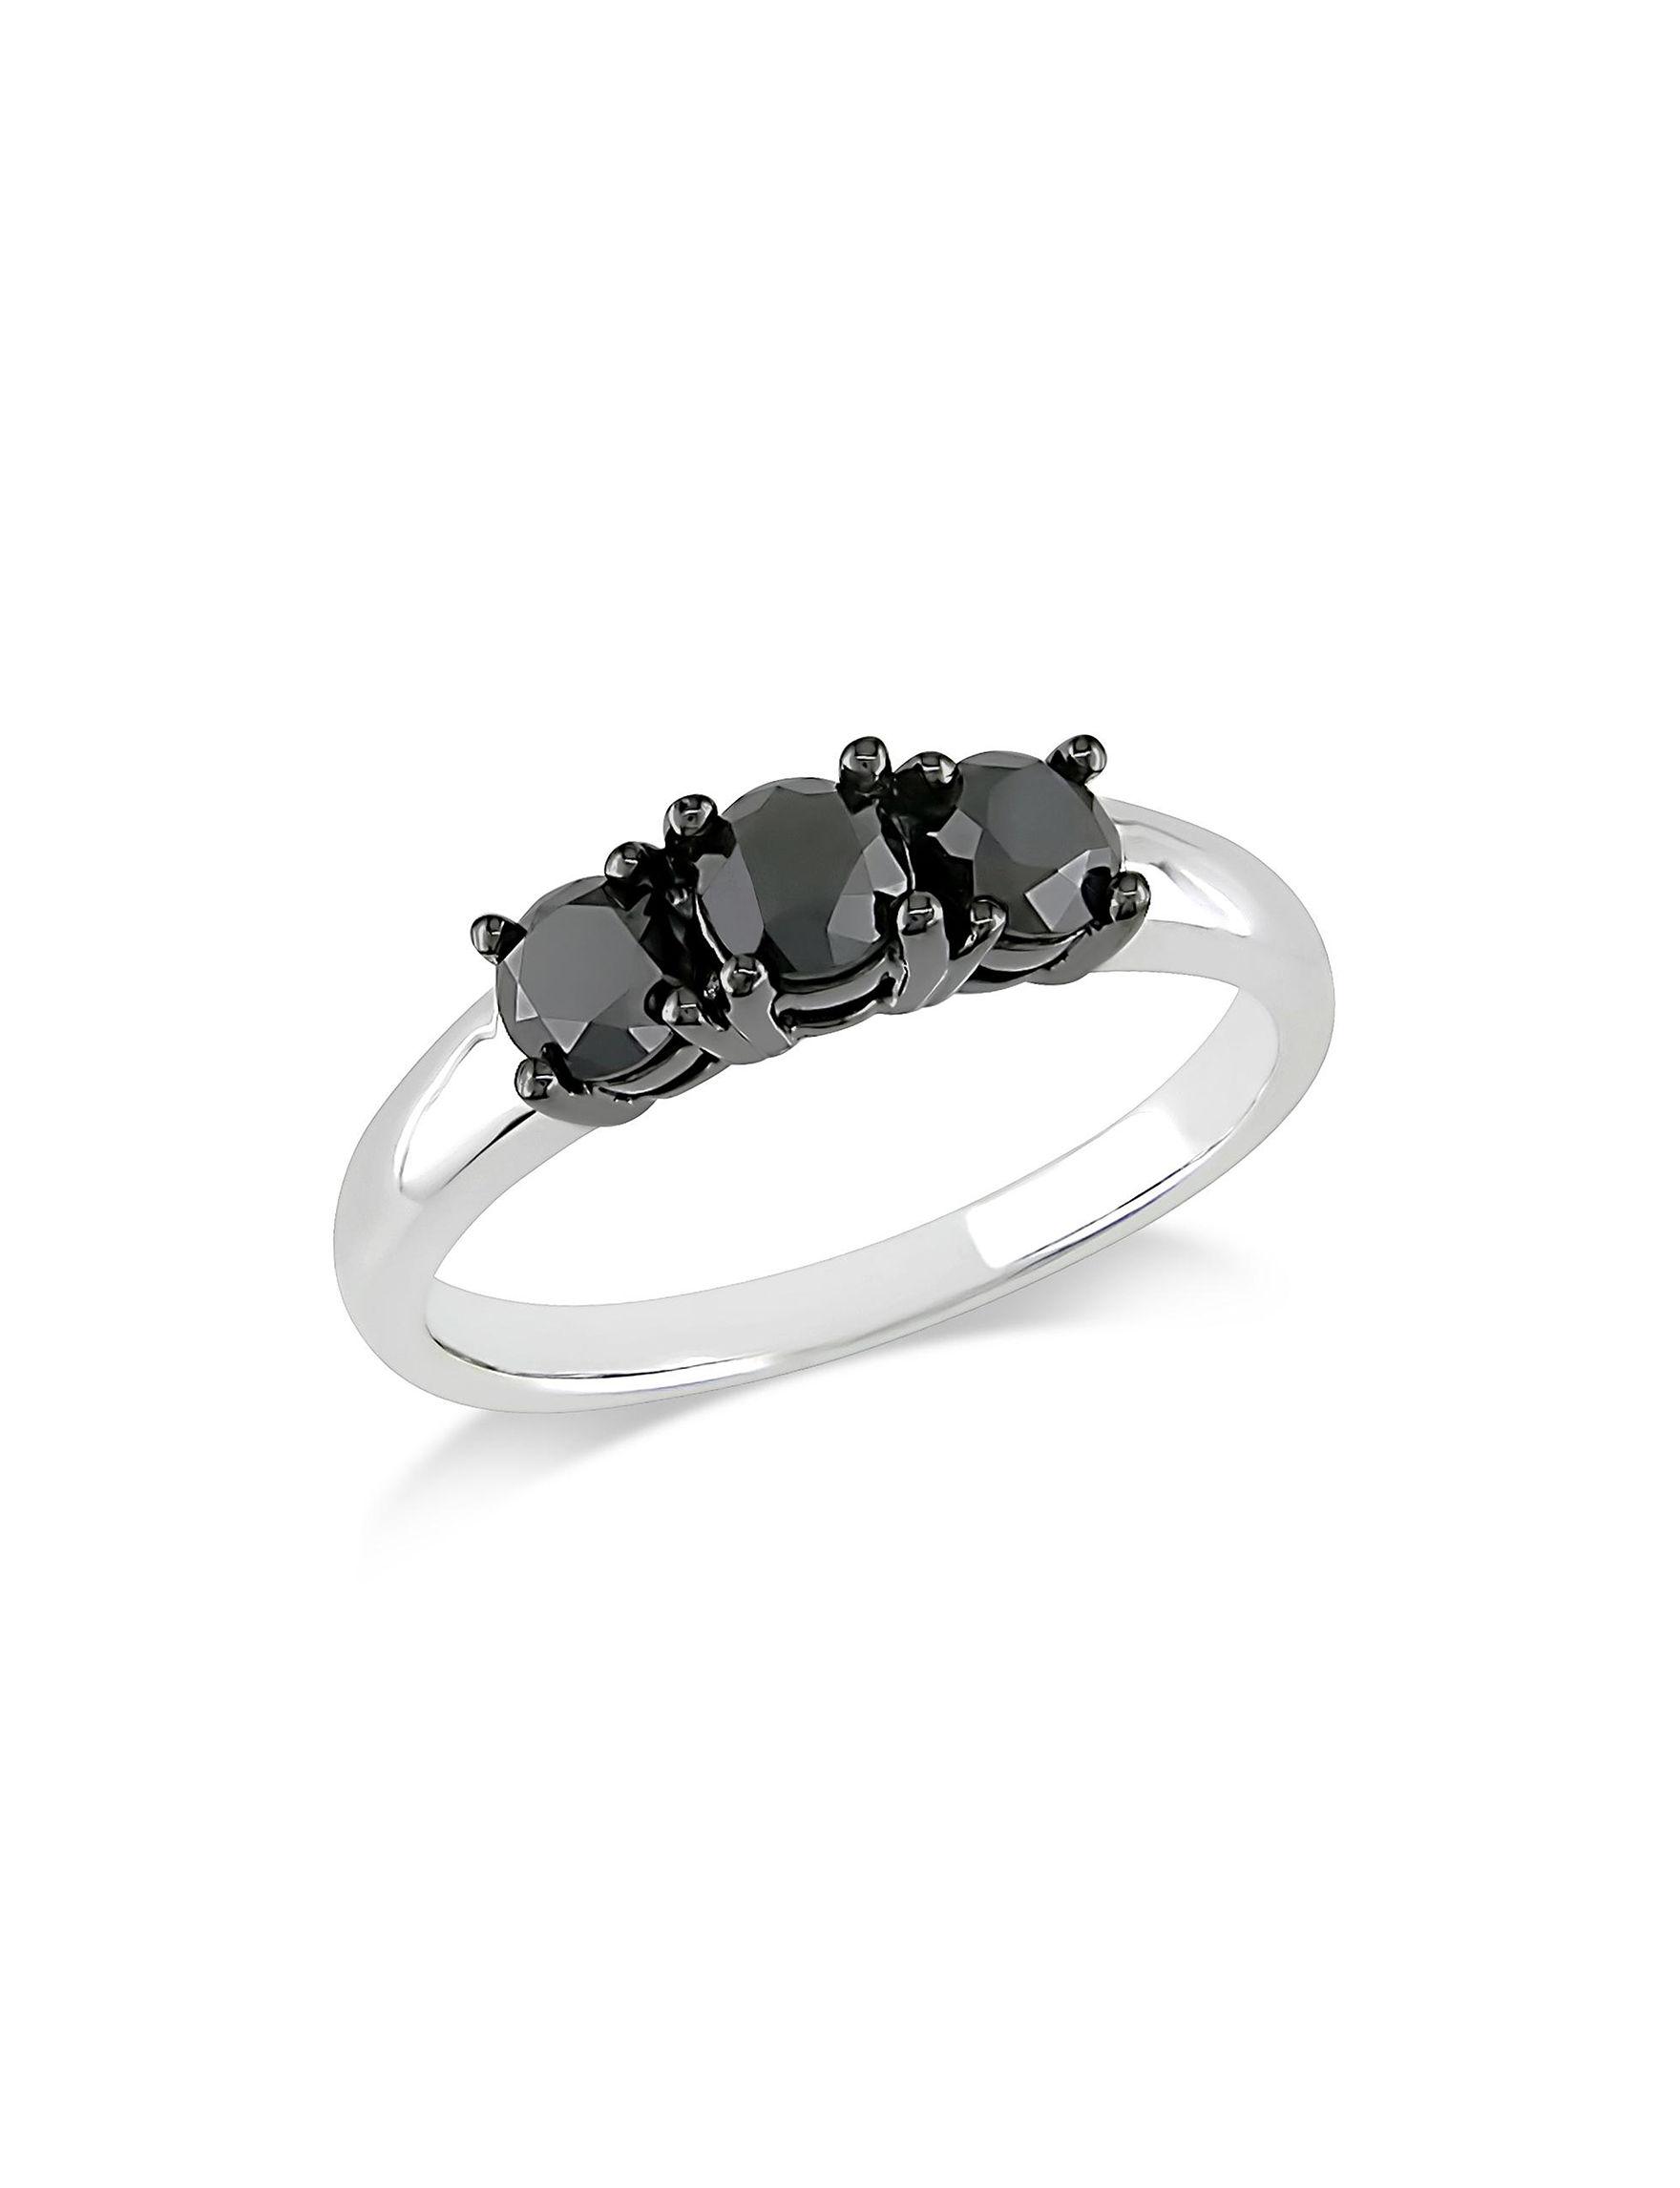 Moonlight Diamonds White Gold Rings Fine Jewelry